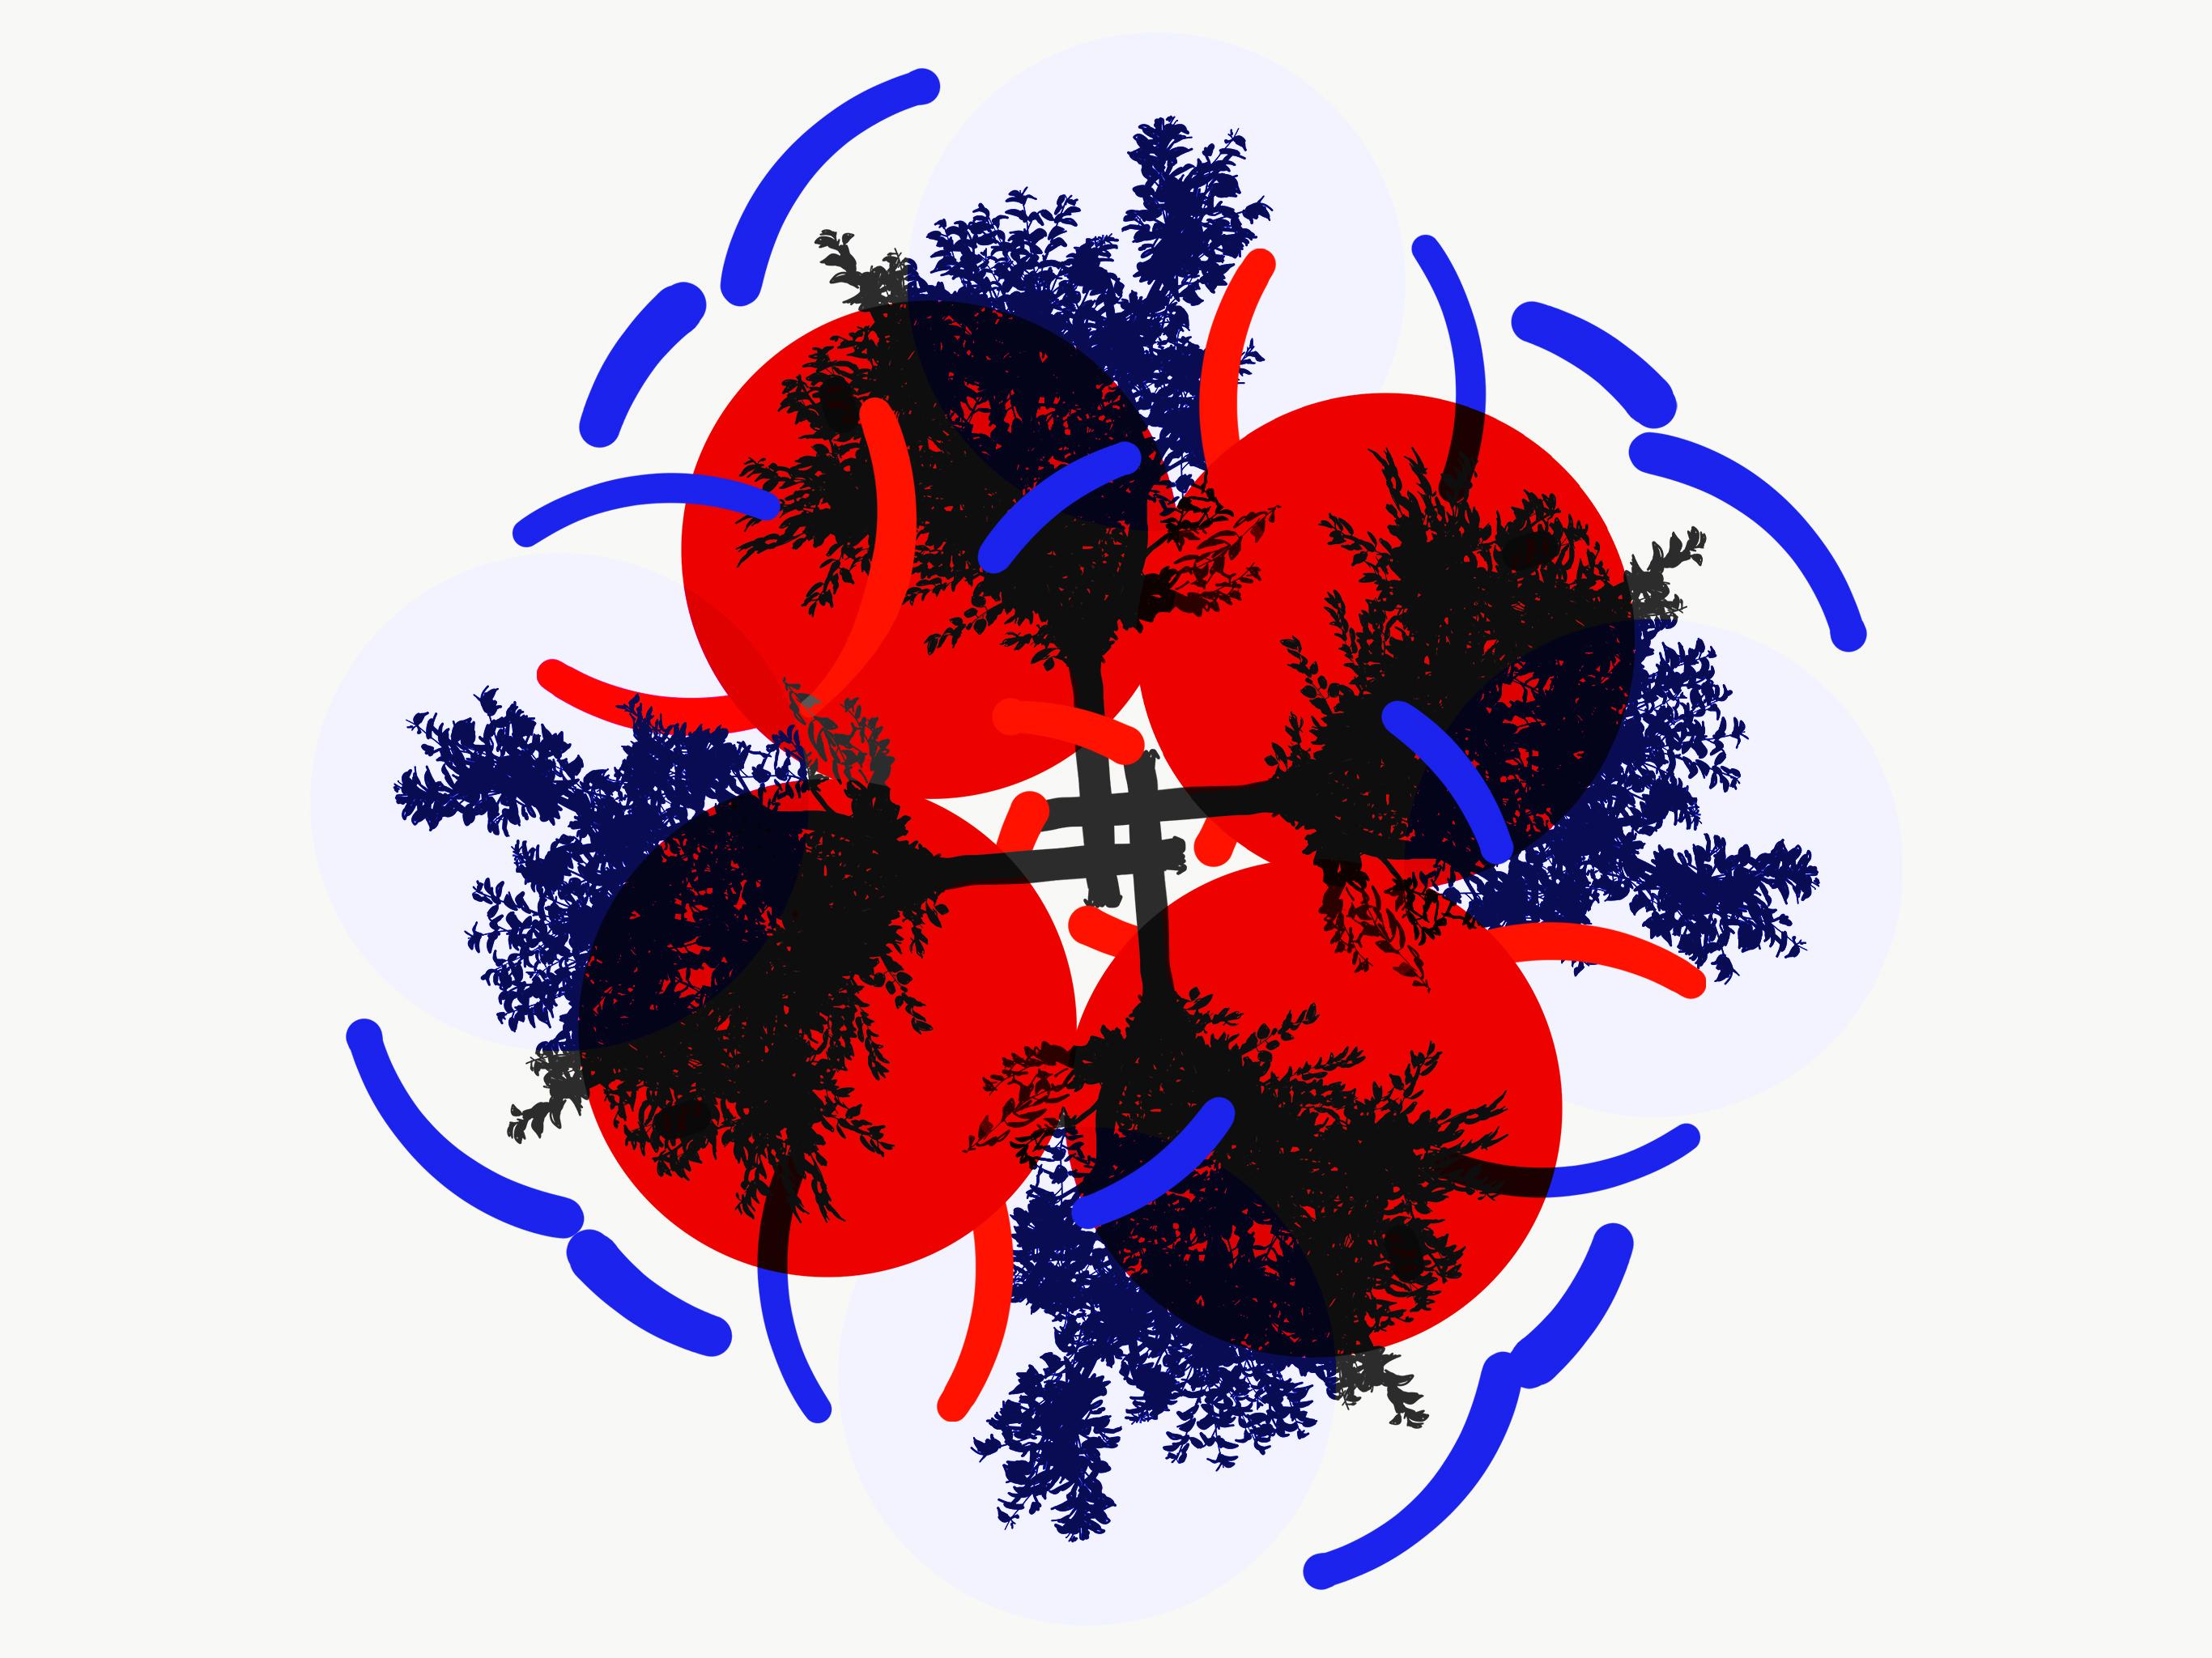 cerisiervirgulescouleurs